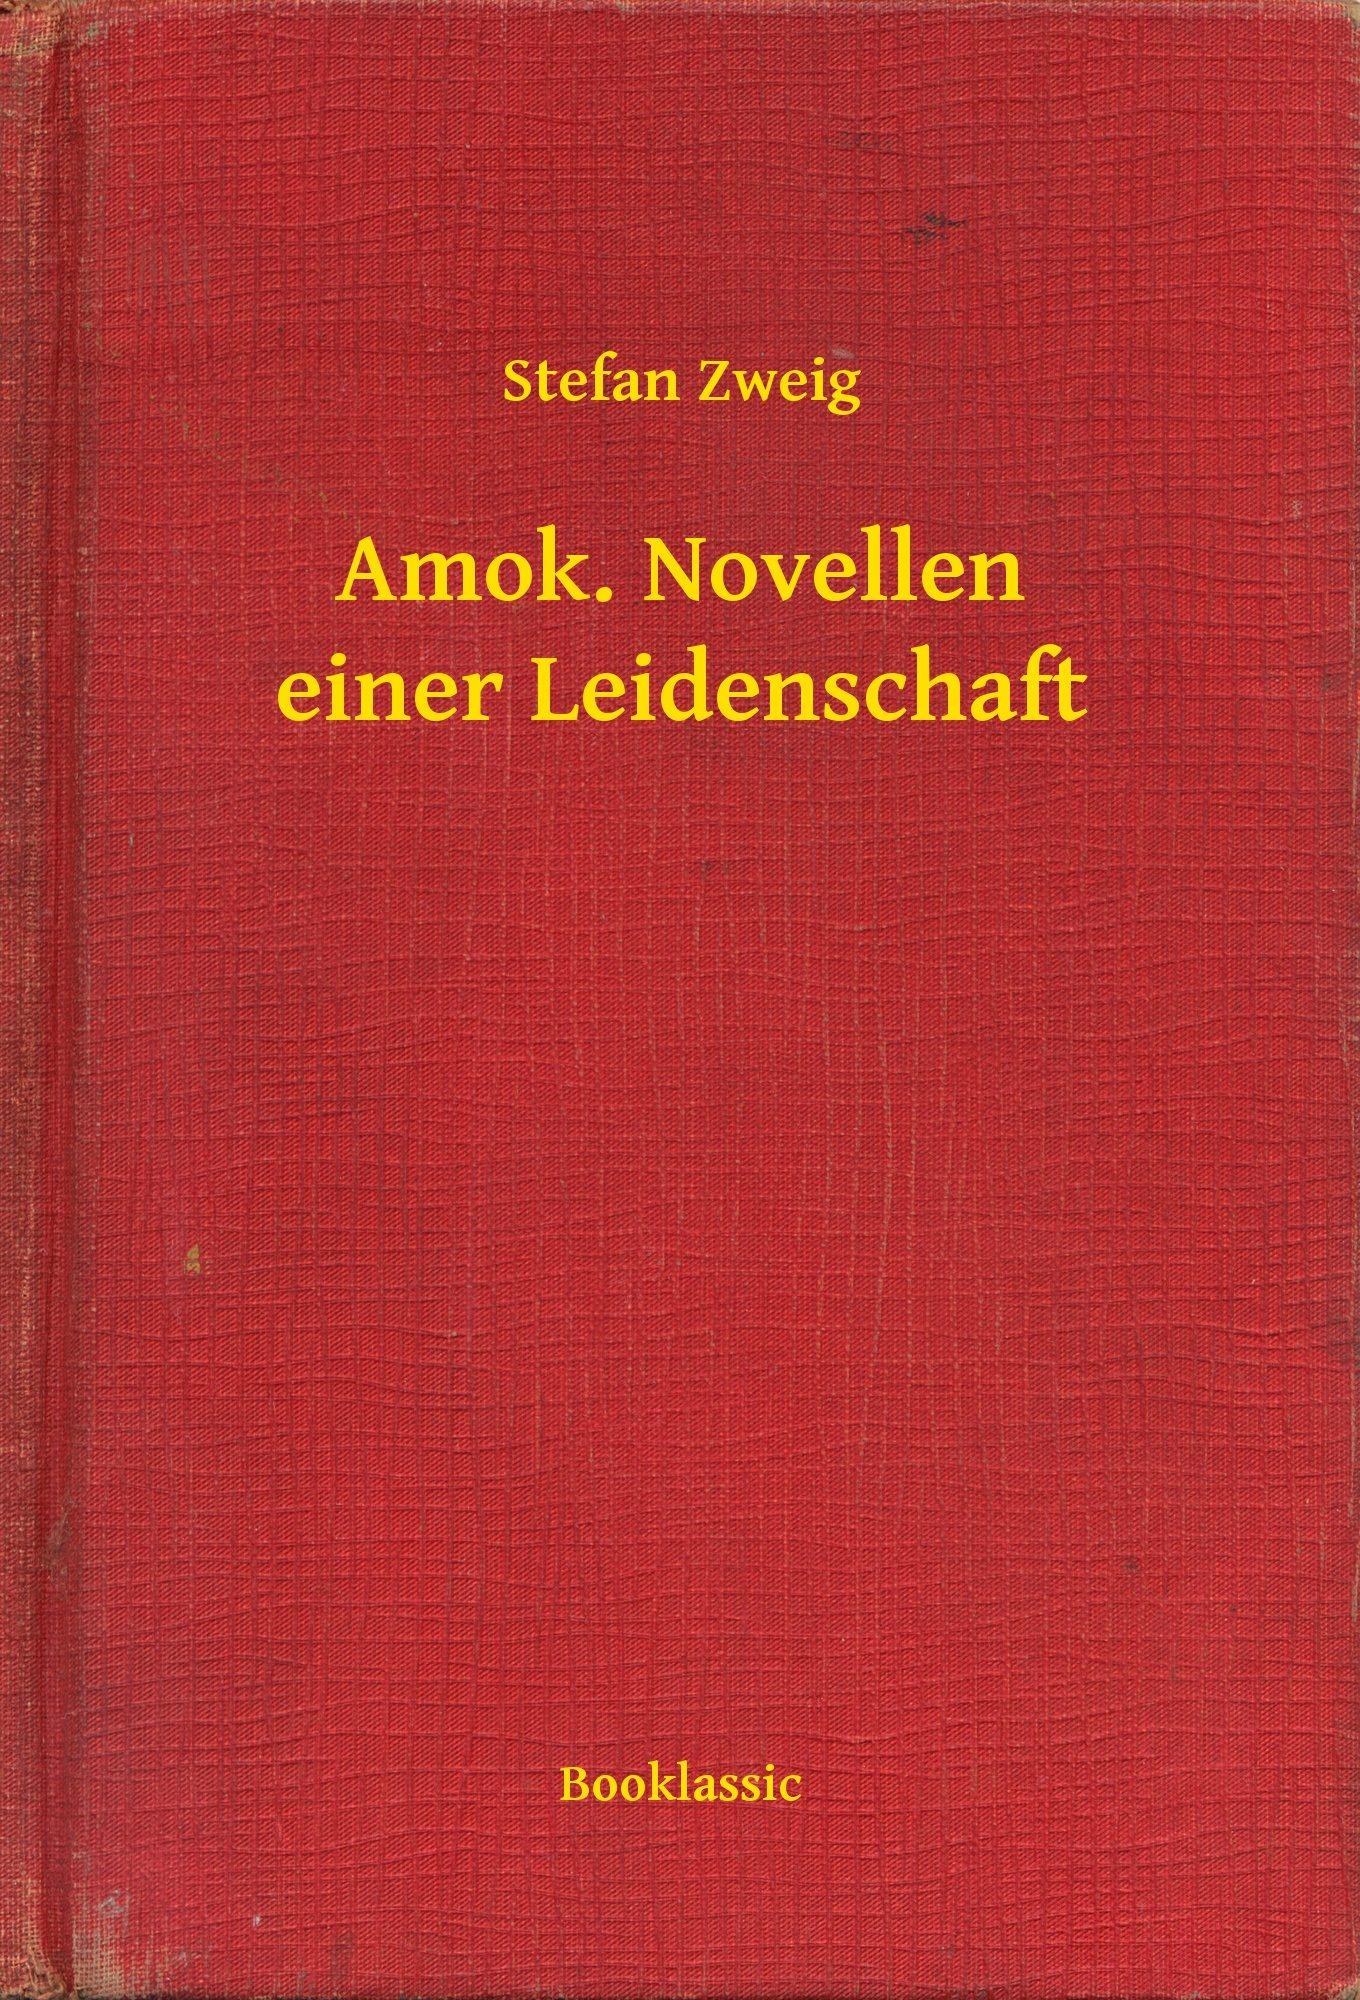 Amok Novellen Einer Leidenschaft Ebook Stefan Zweig Descargar